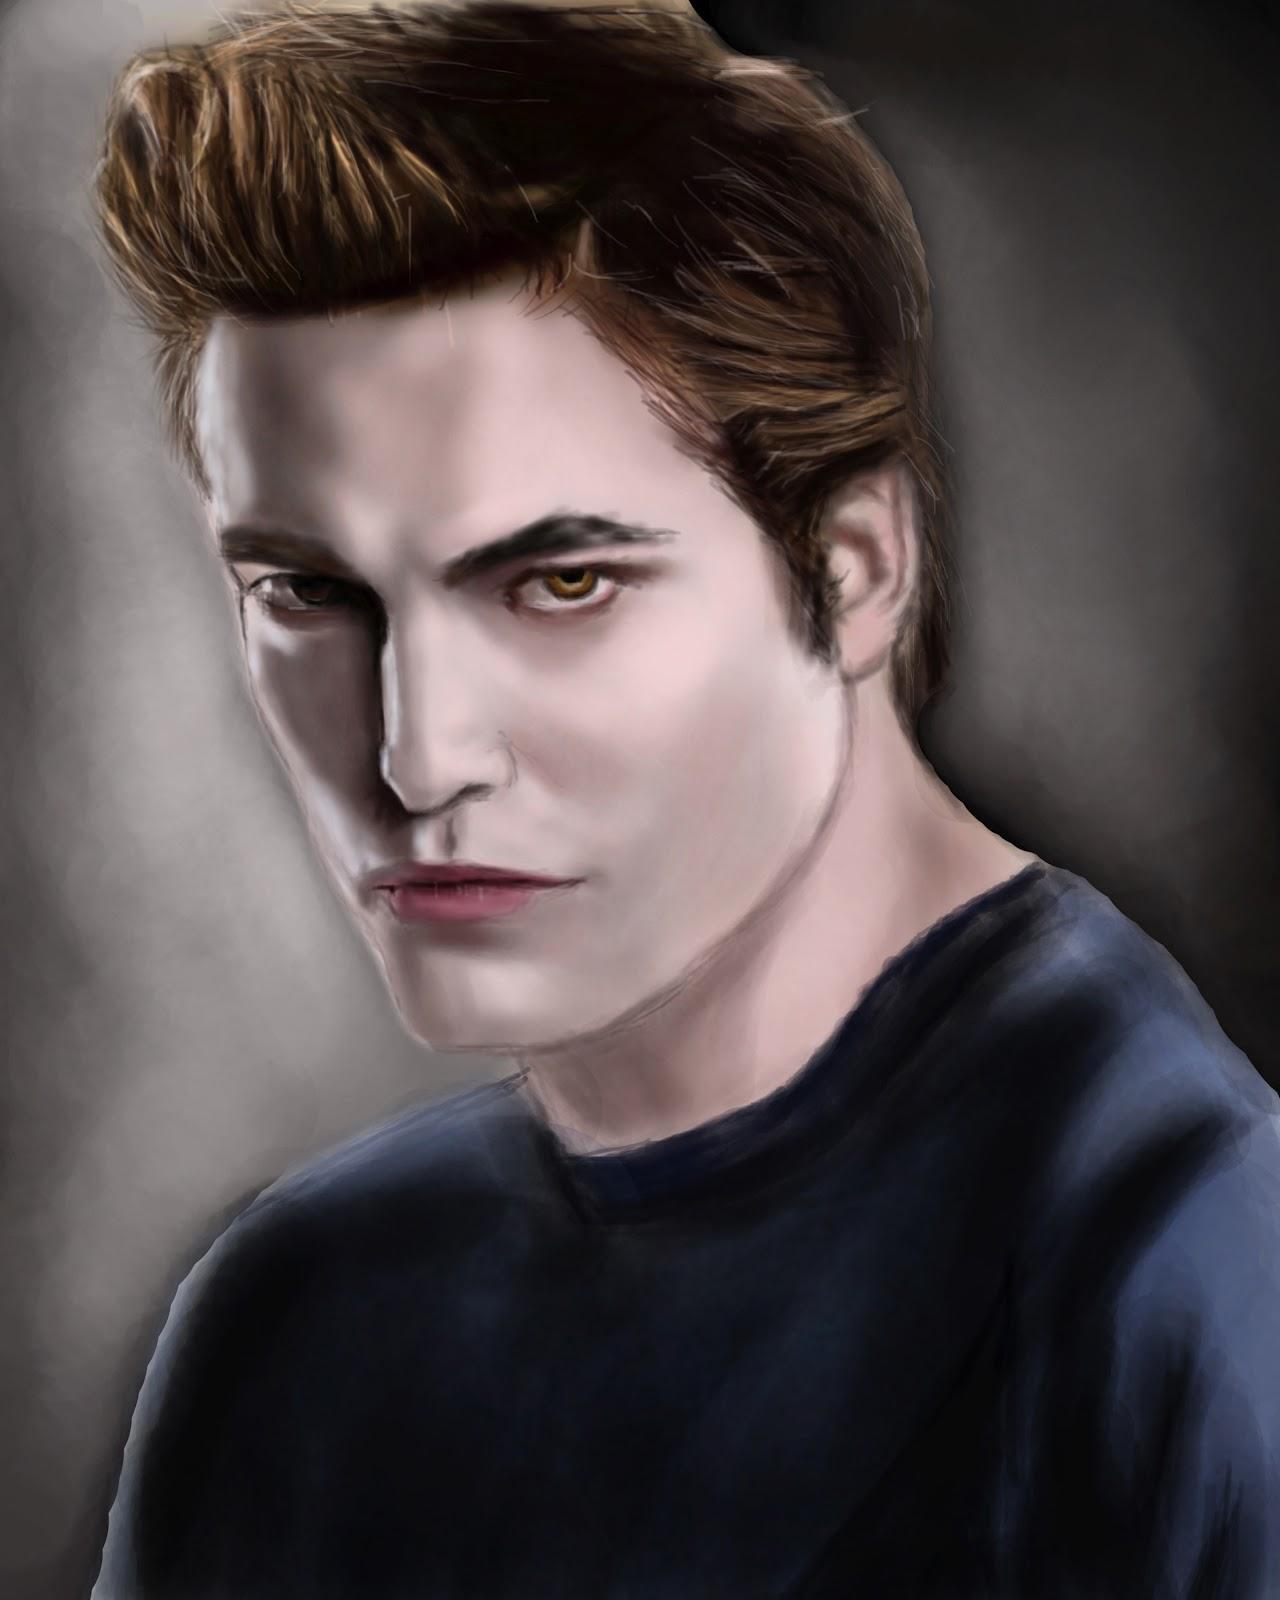 Digital Painting of Twilight Saga, Edward Cullen | a2ztuts